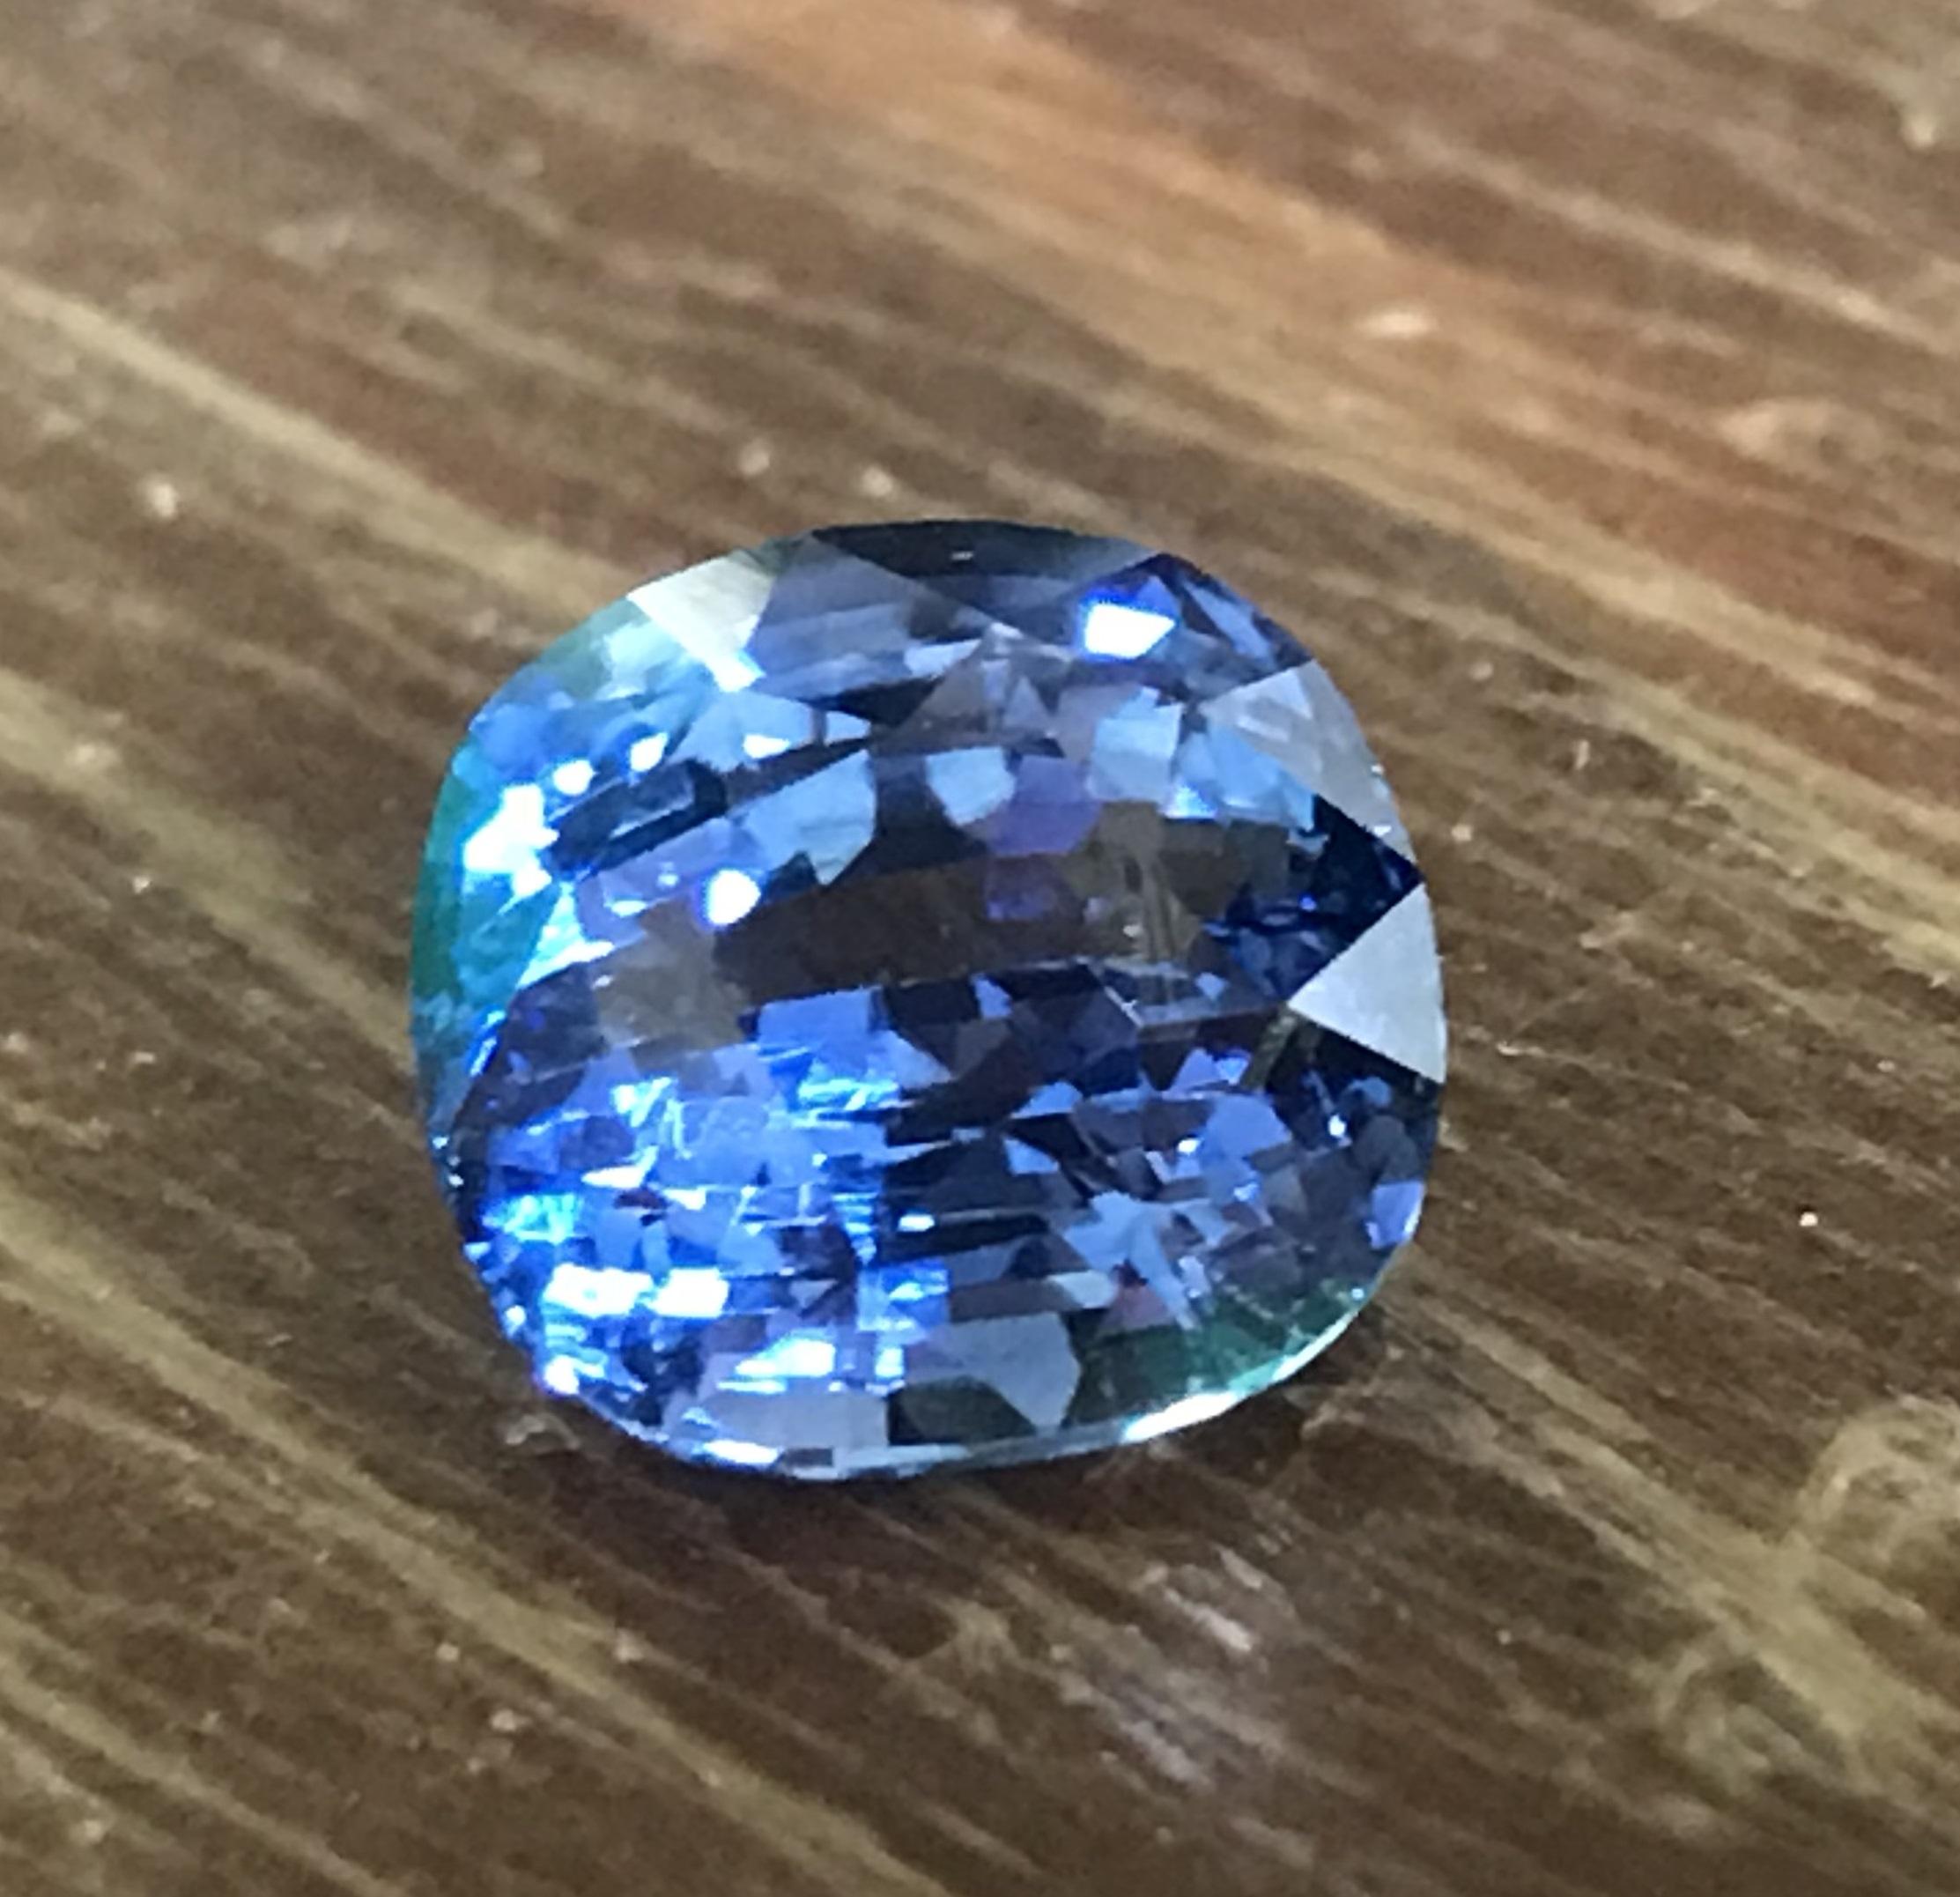 Sapphire, 4.78 Ct - Image 4 of 6